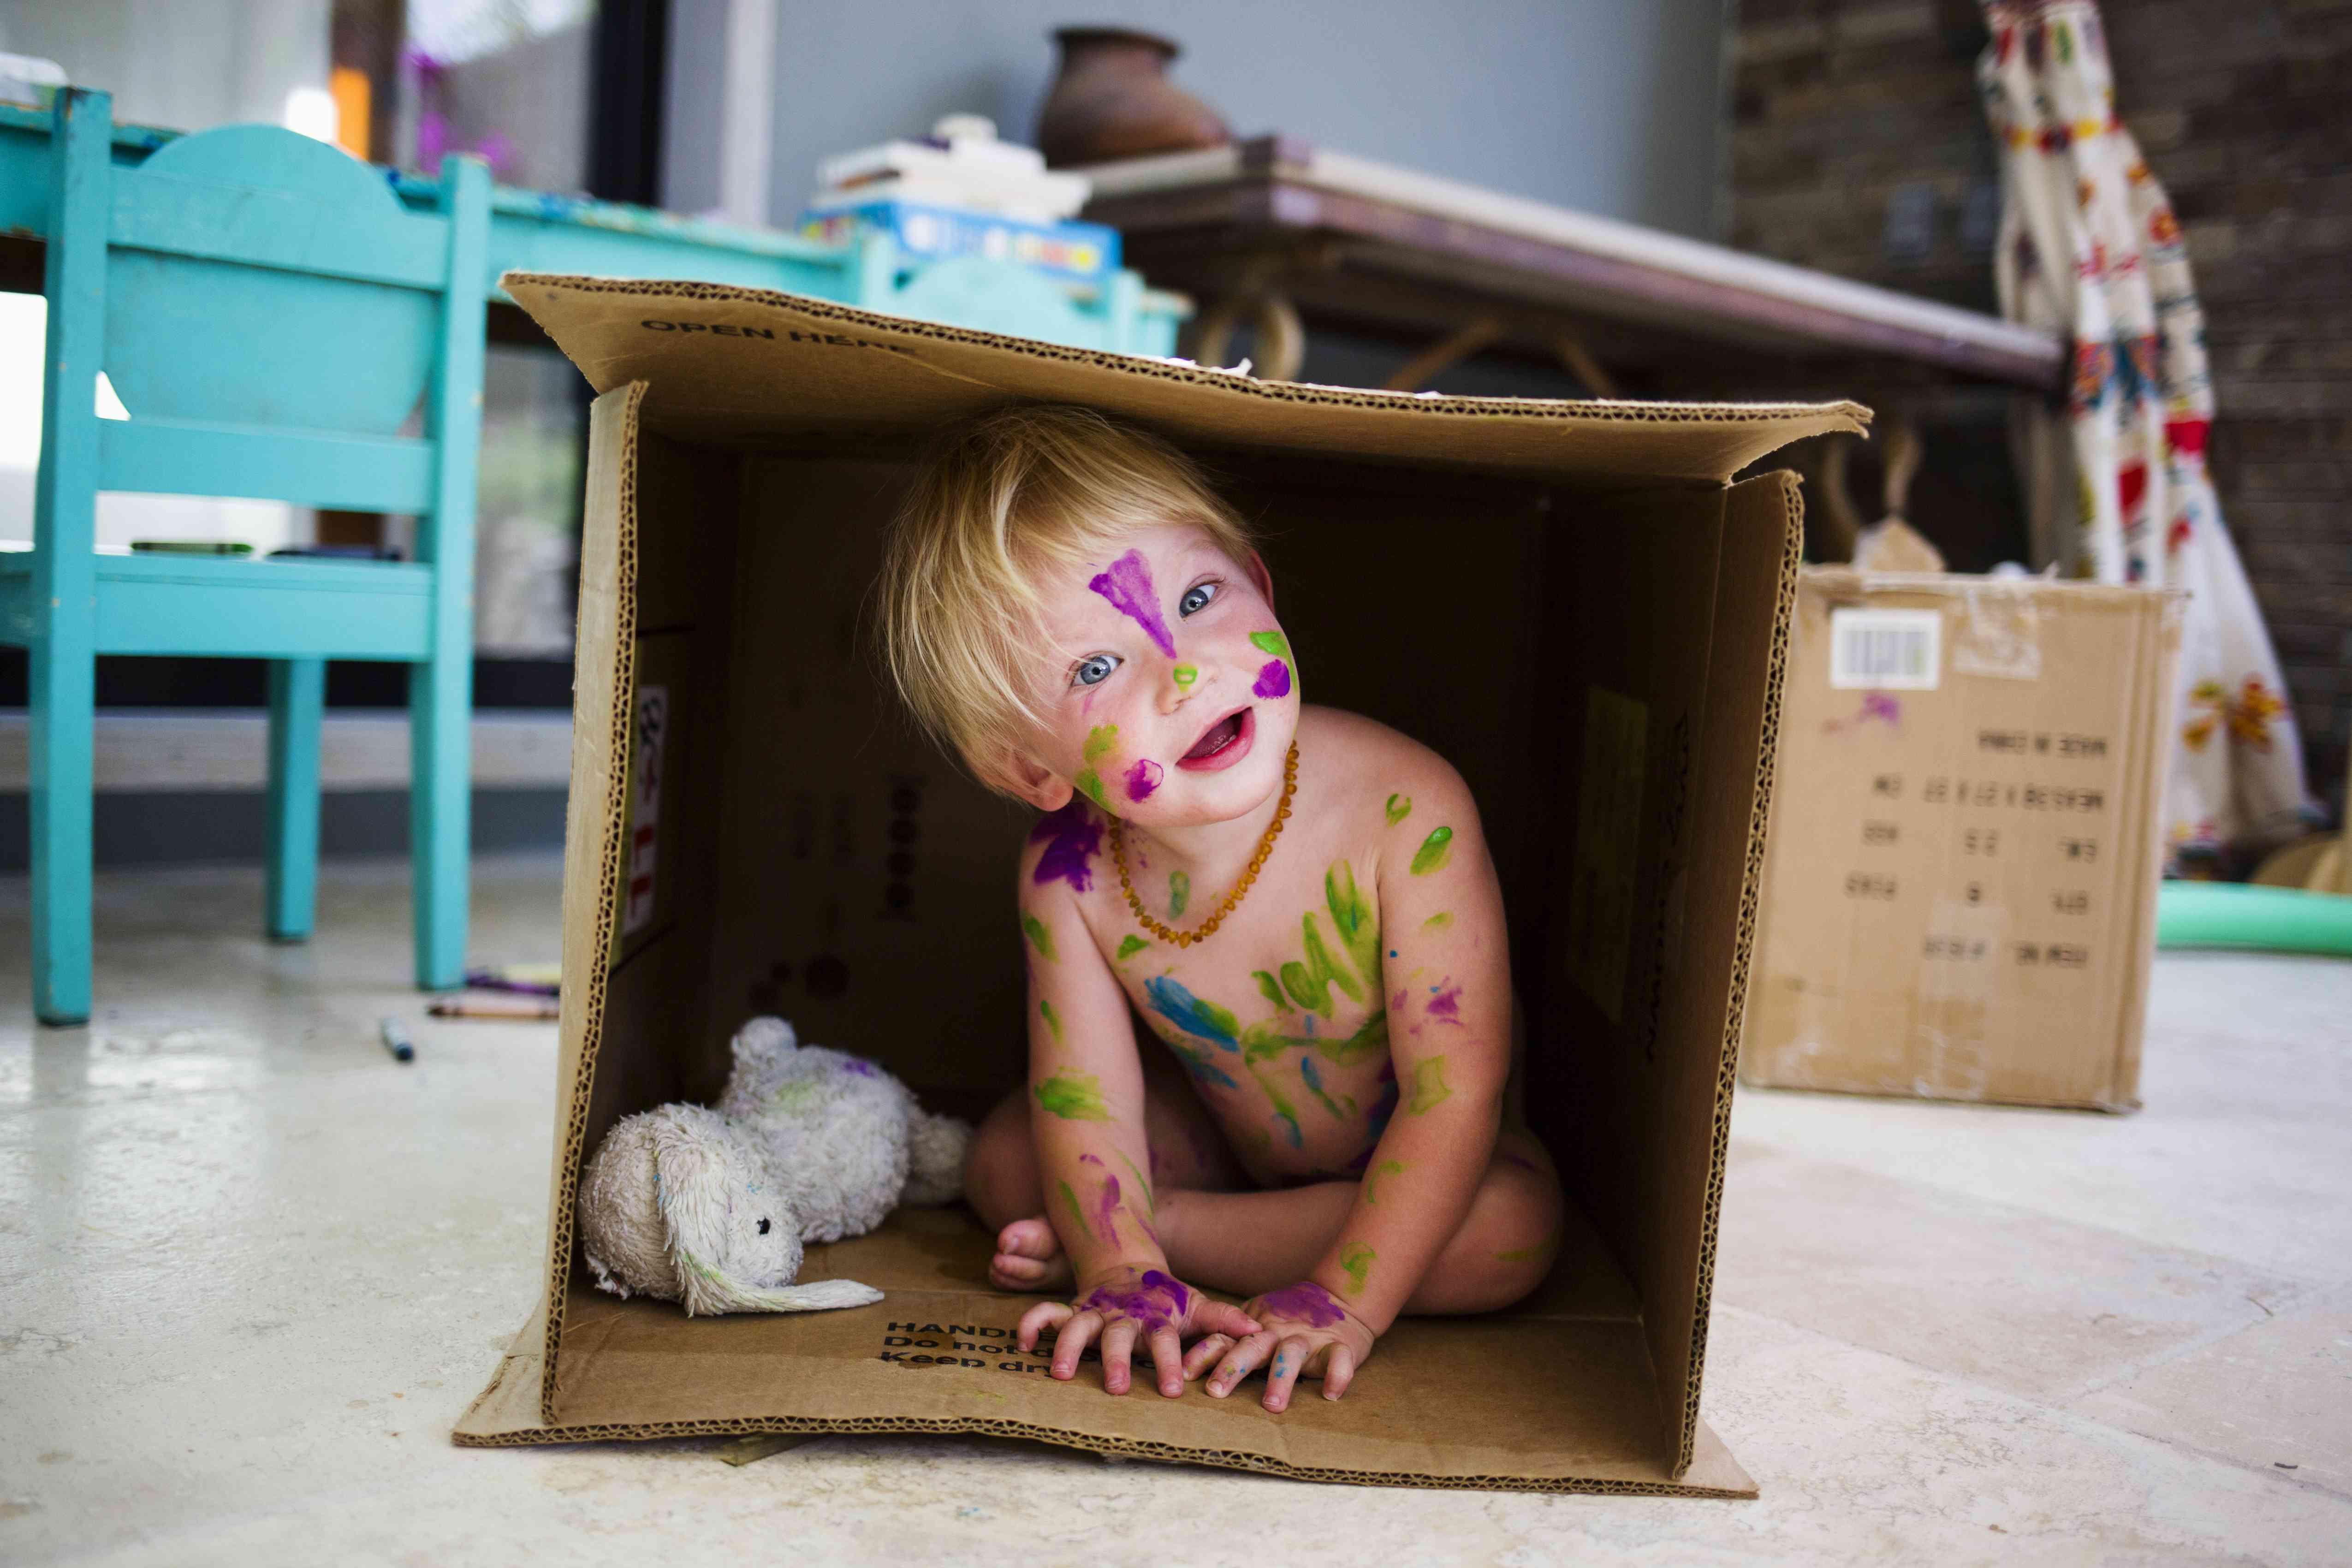 Naked baby boy wearing body paint in cardboard box on floor